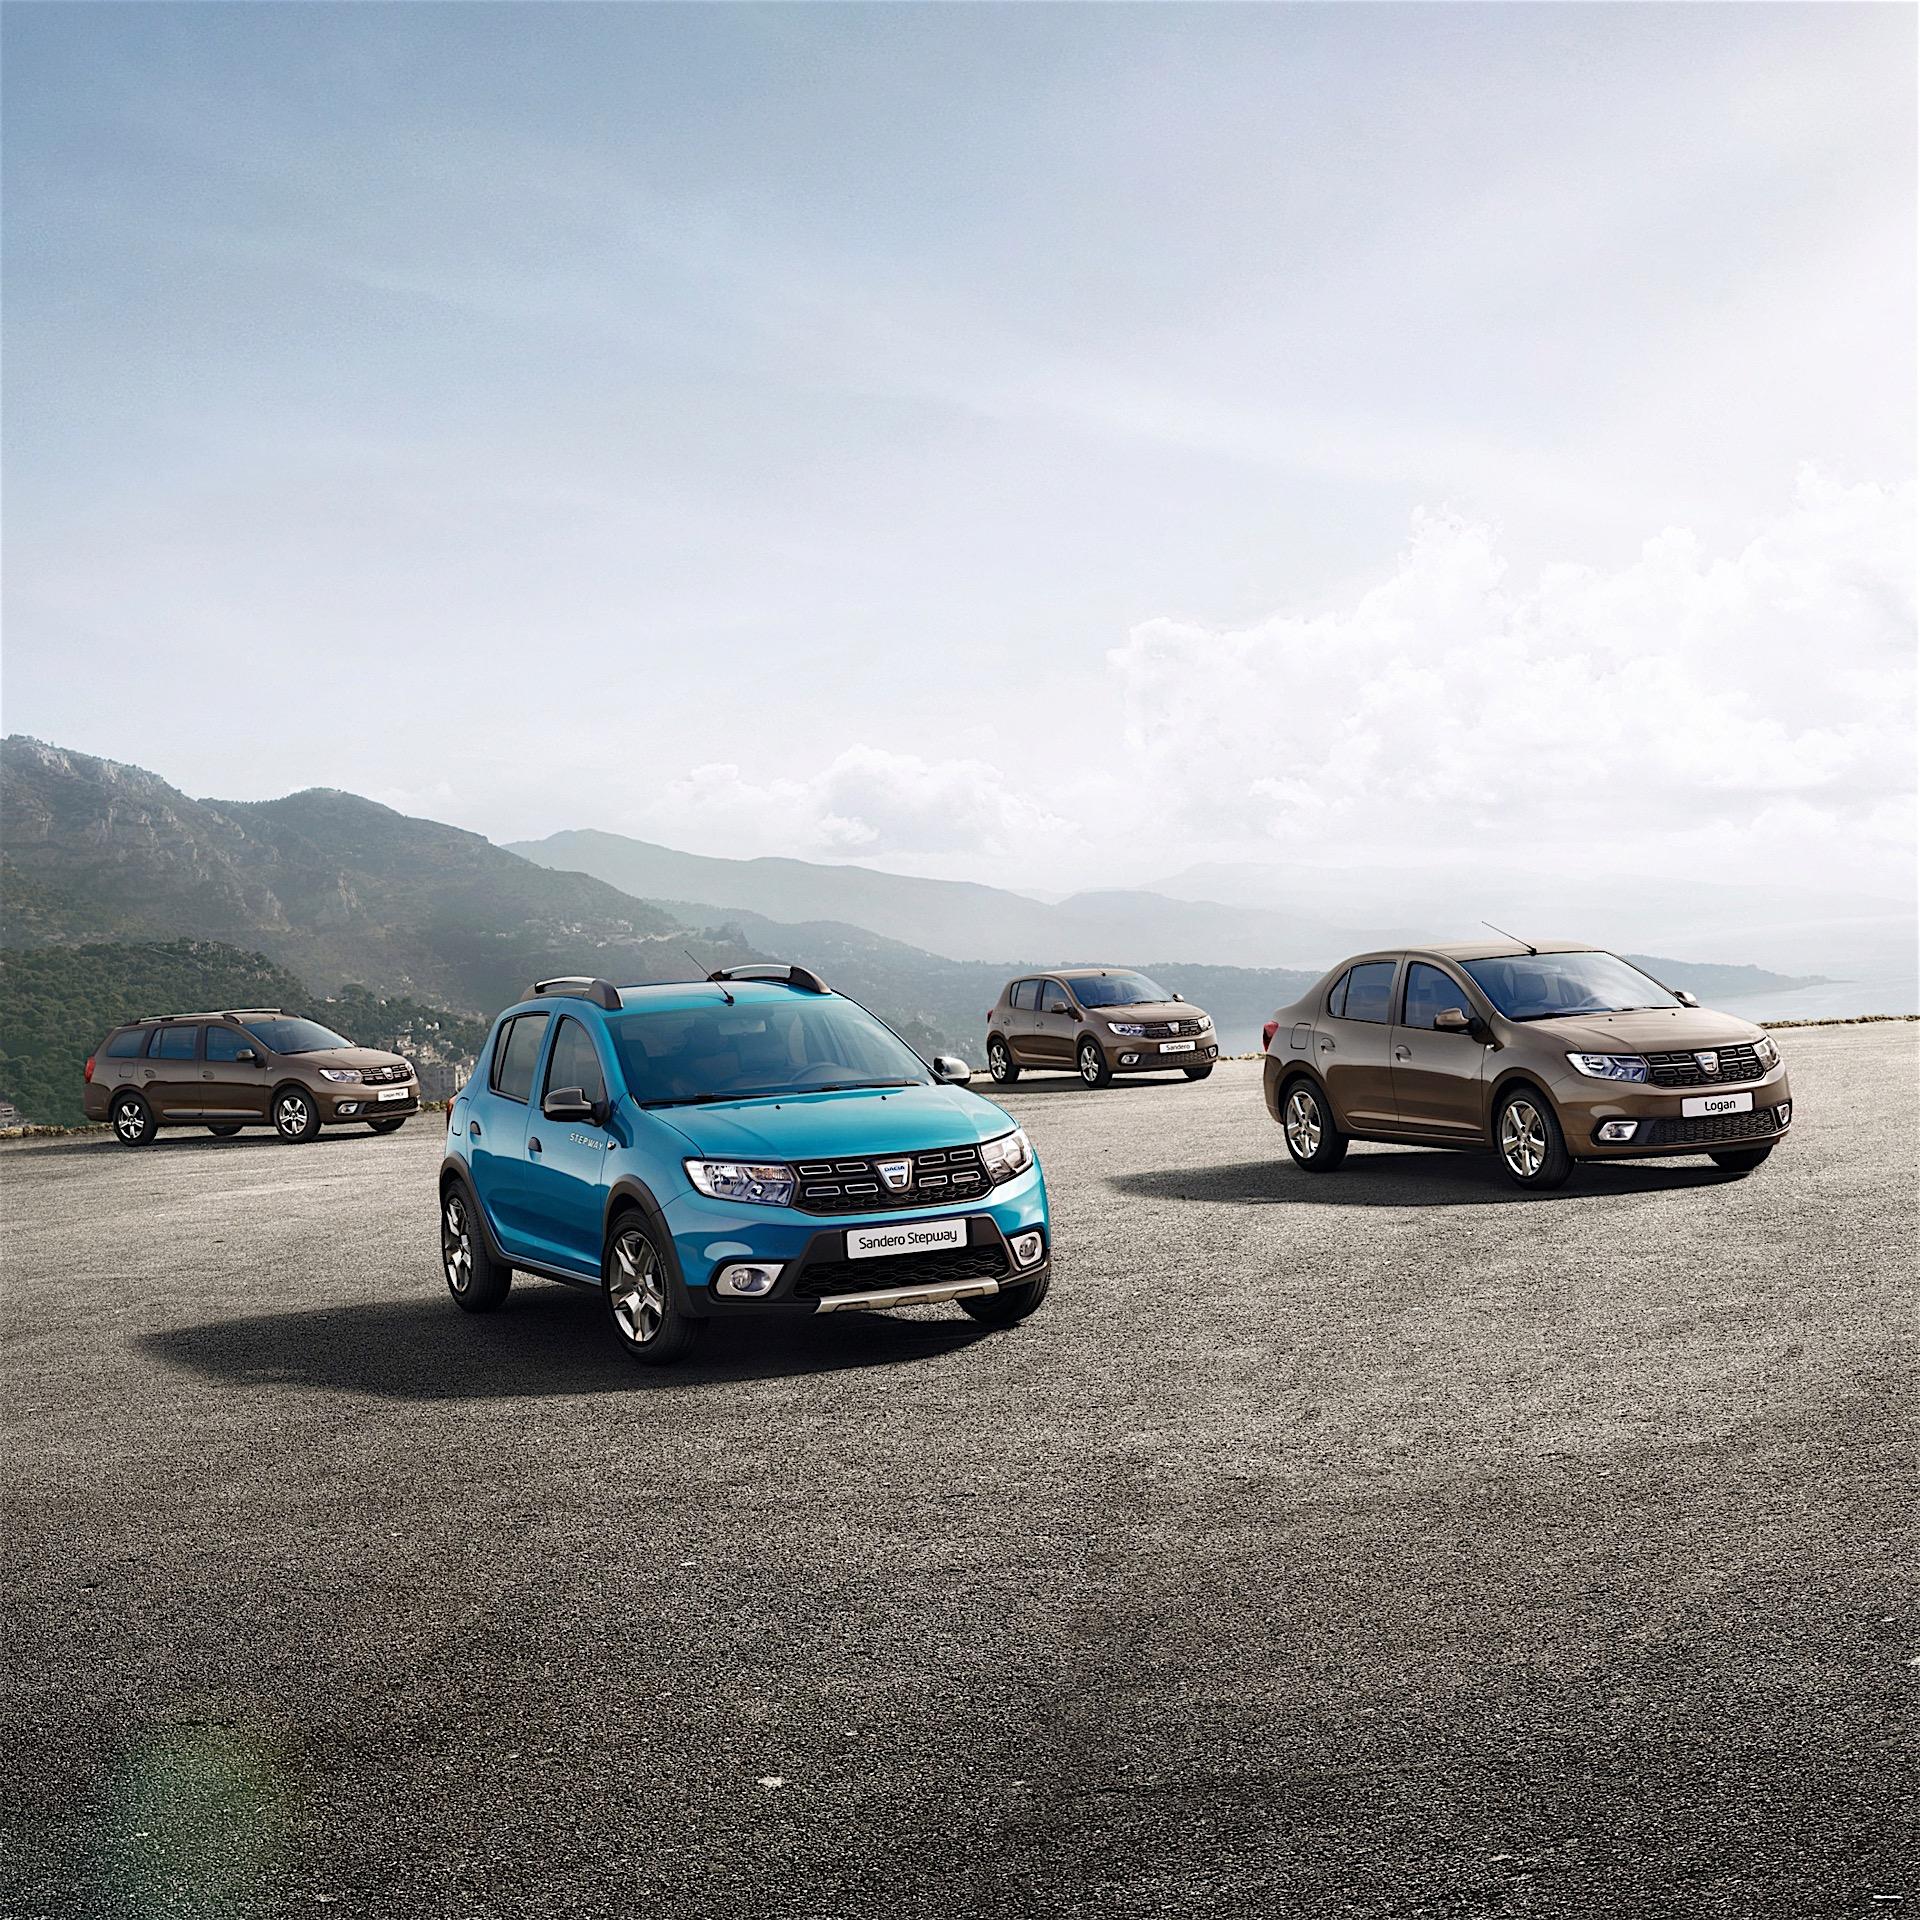 Dacia Sandero facelift, Dacia Logan facelift revealed ahead of Paris premiere